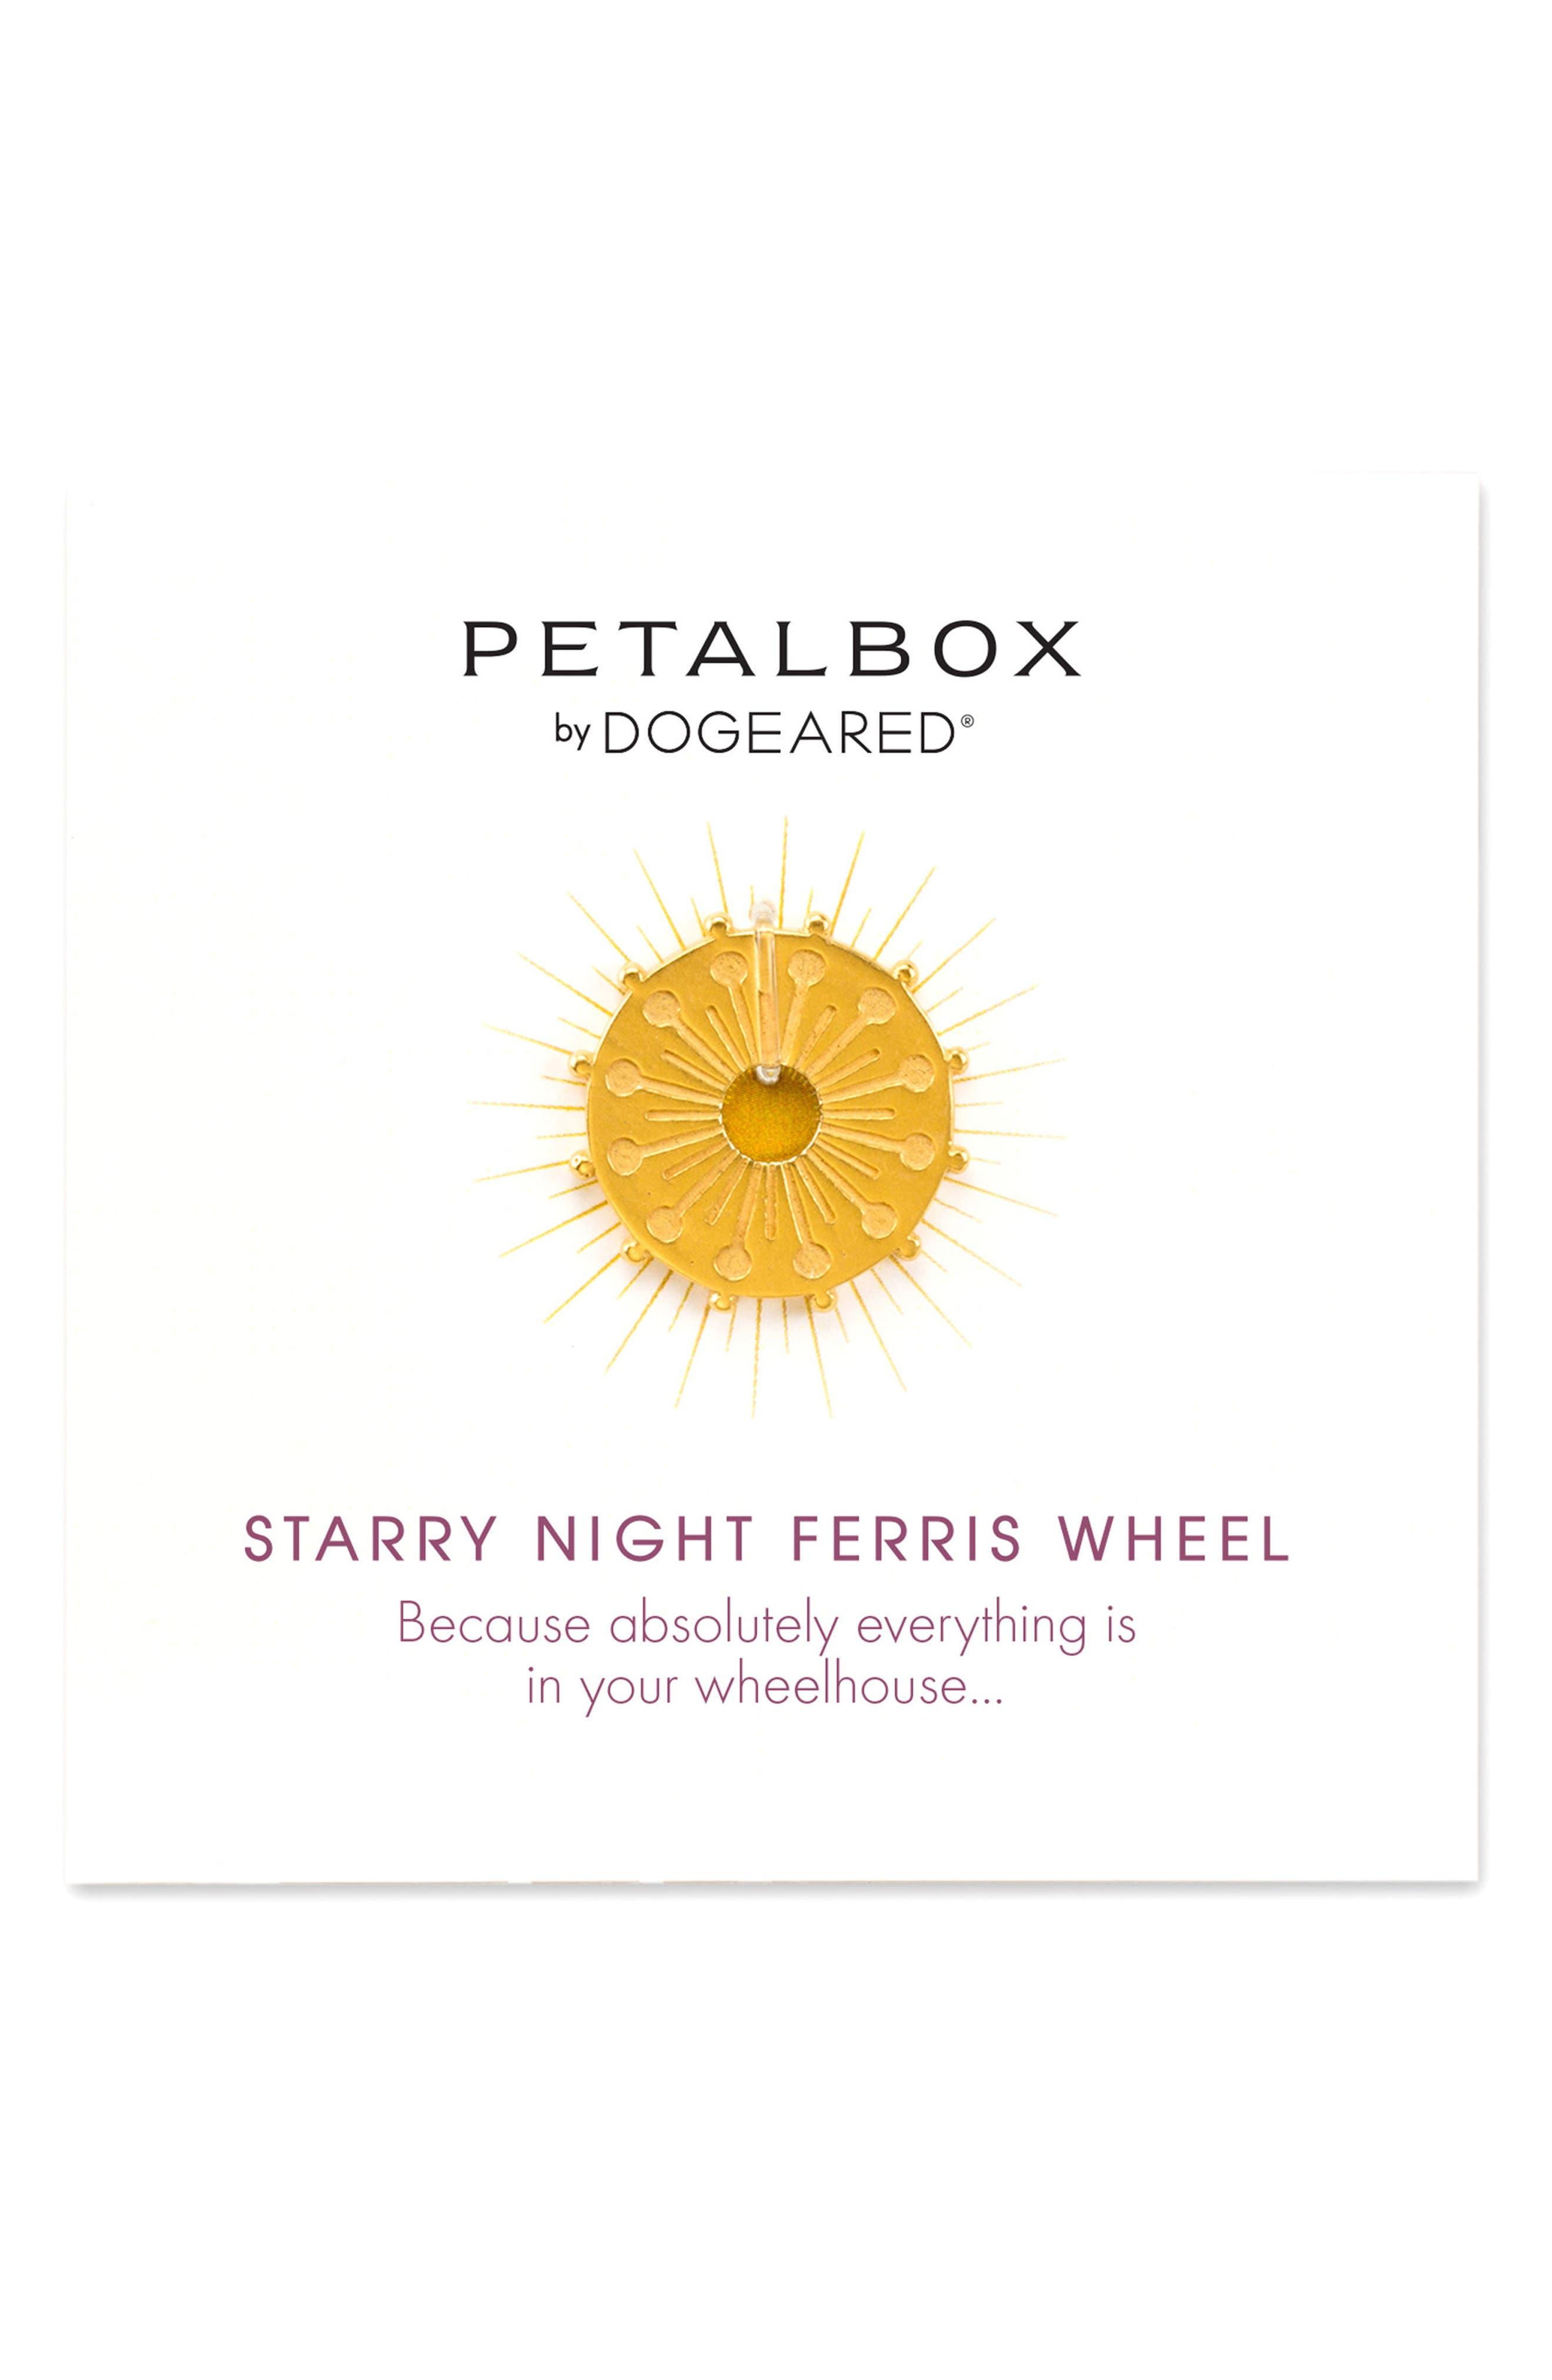 Dogeared Petalbox Starry Night Ferris Wheel Enhancer (Nordstrom Exclusive)